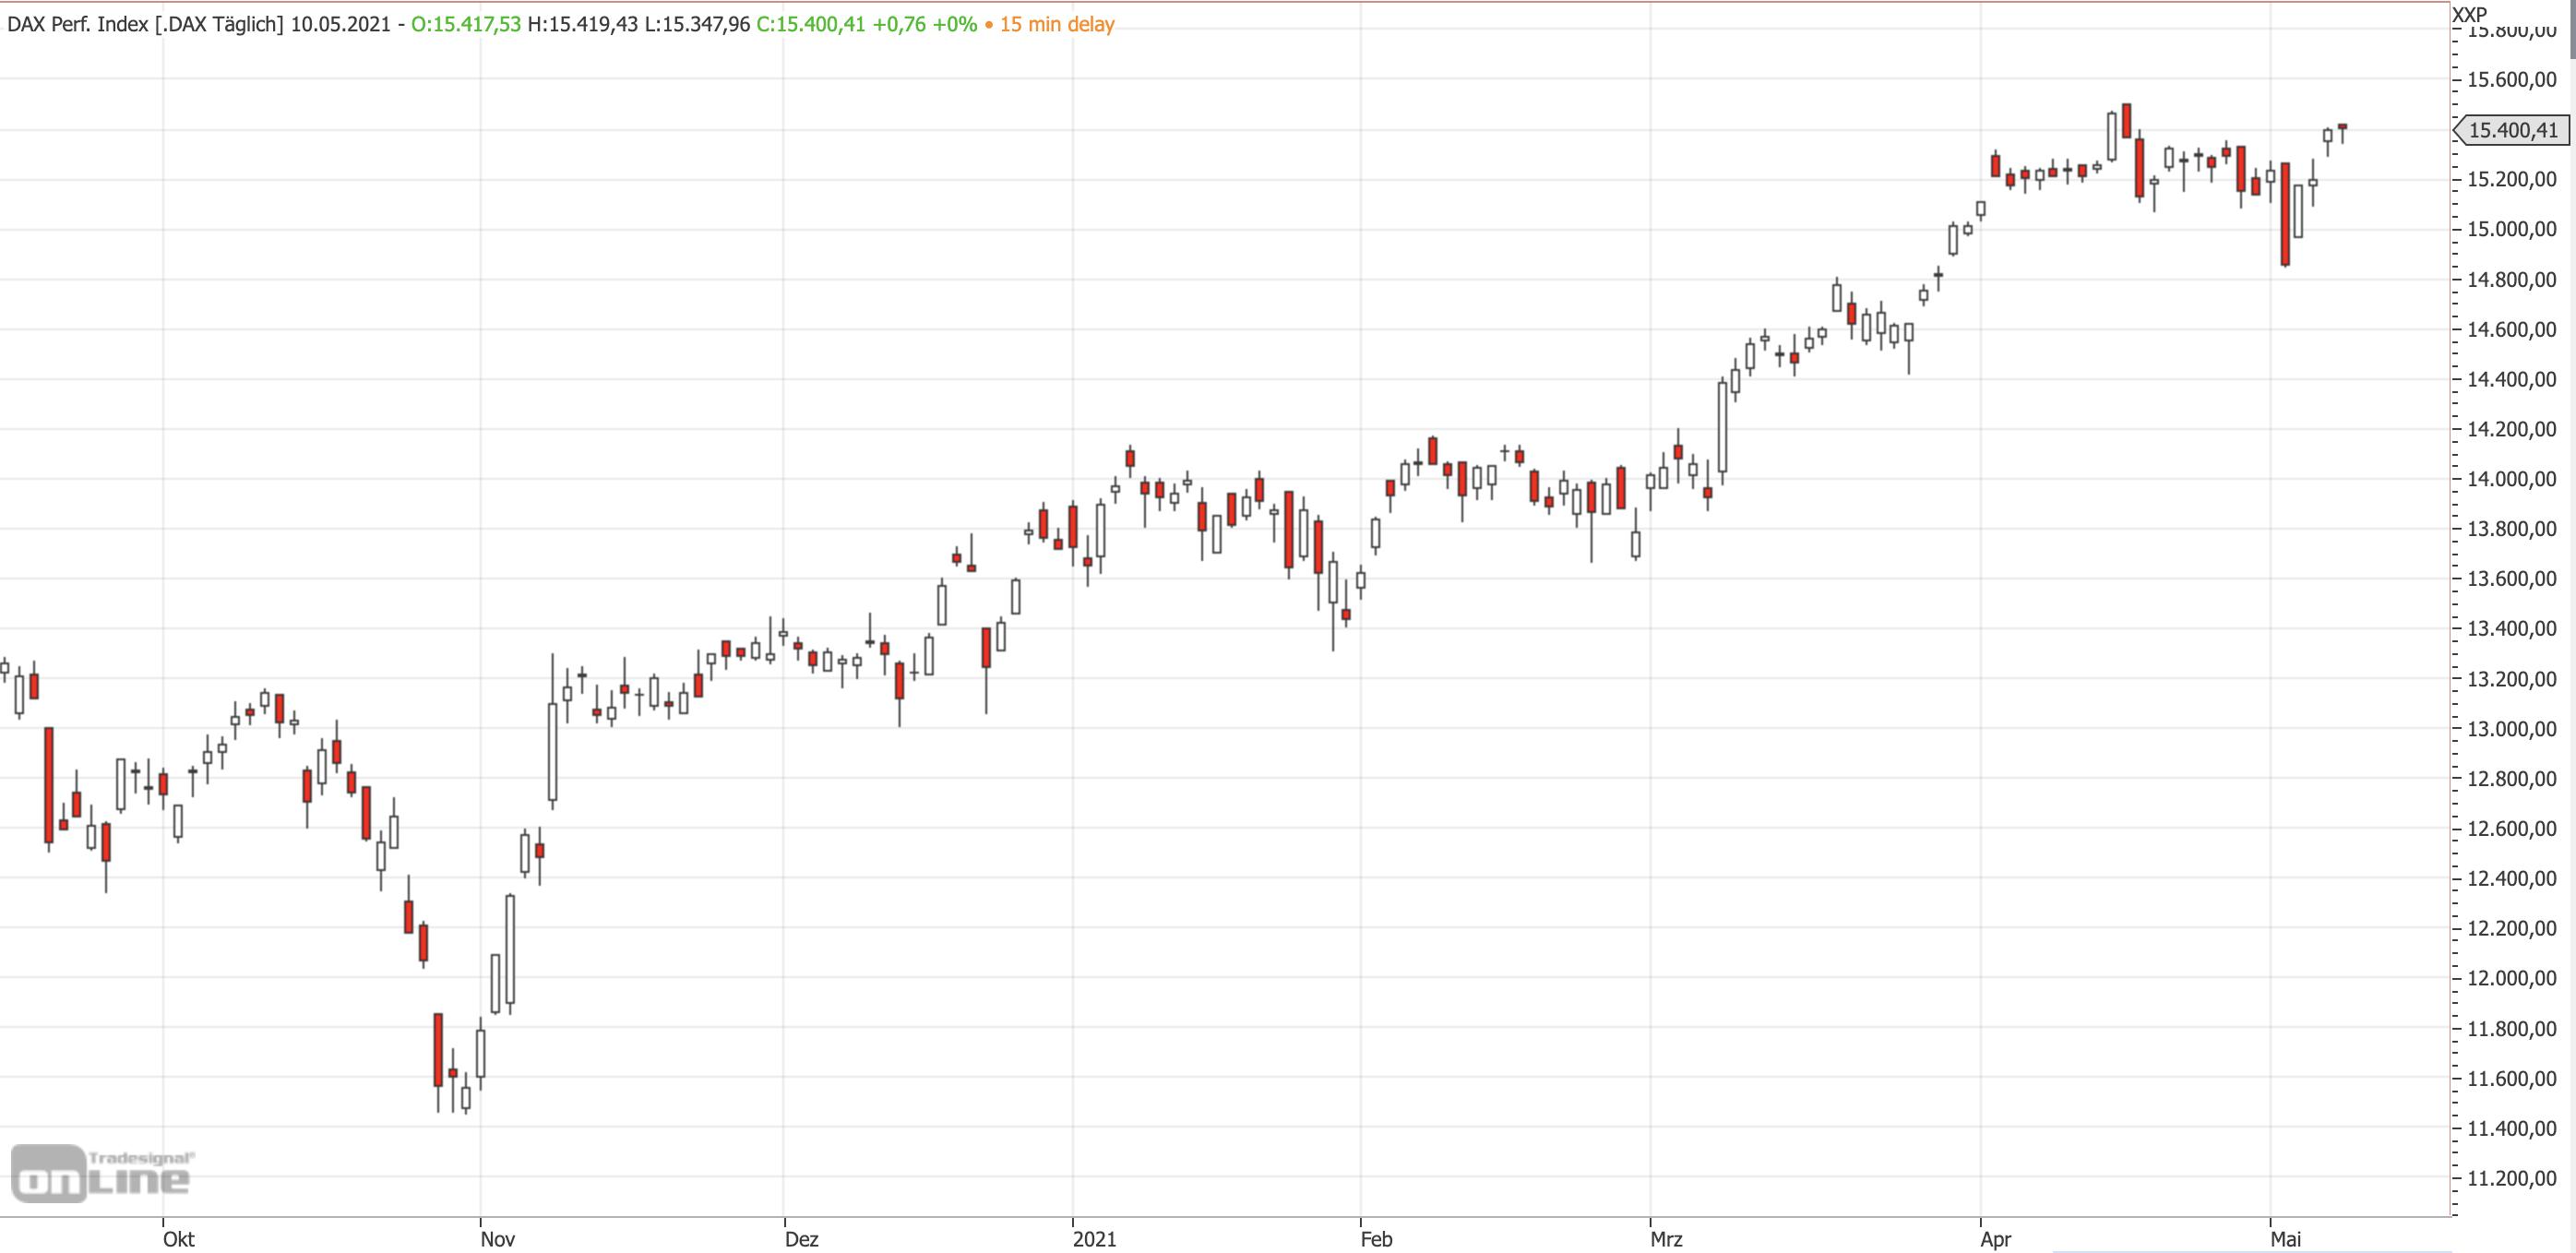 Mittelfristiger DAX-Chart am 10.05.2021